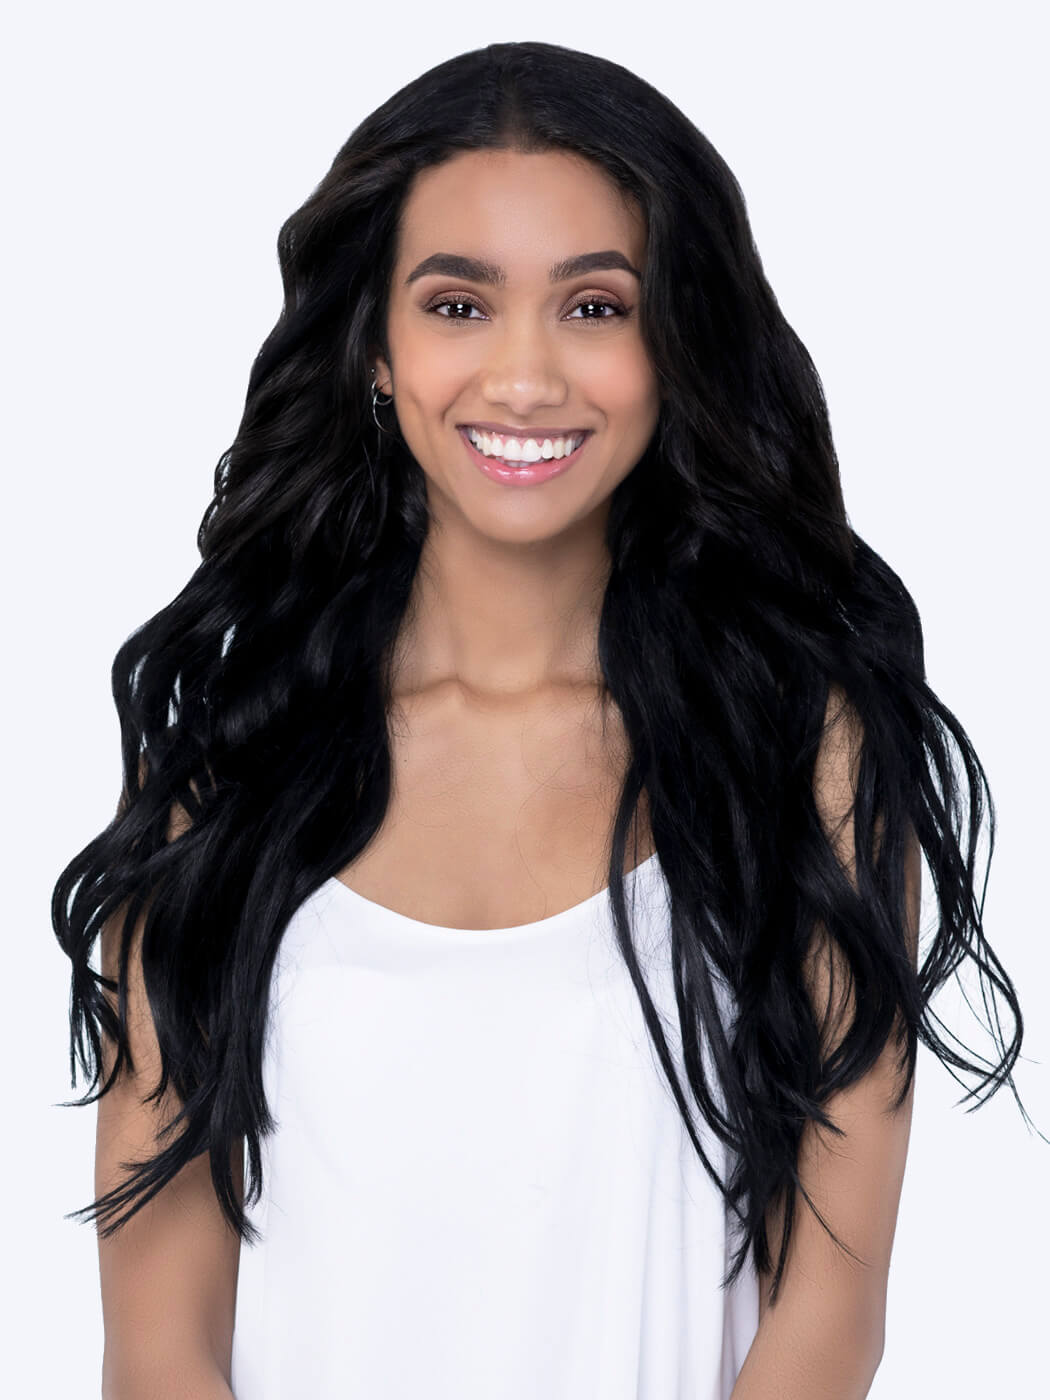 Real Human Hair Extensions | Best Hair Extensions | Black Hair Extensions | 20 Inch Hair Extensions | Remy Hair Extensions